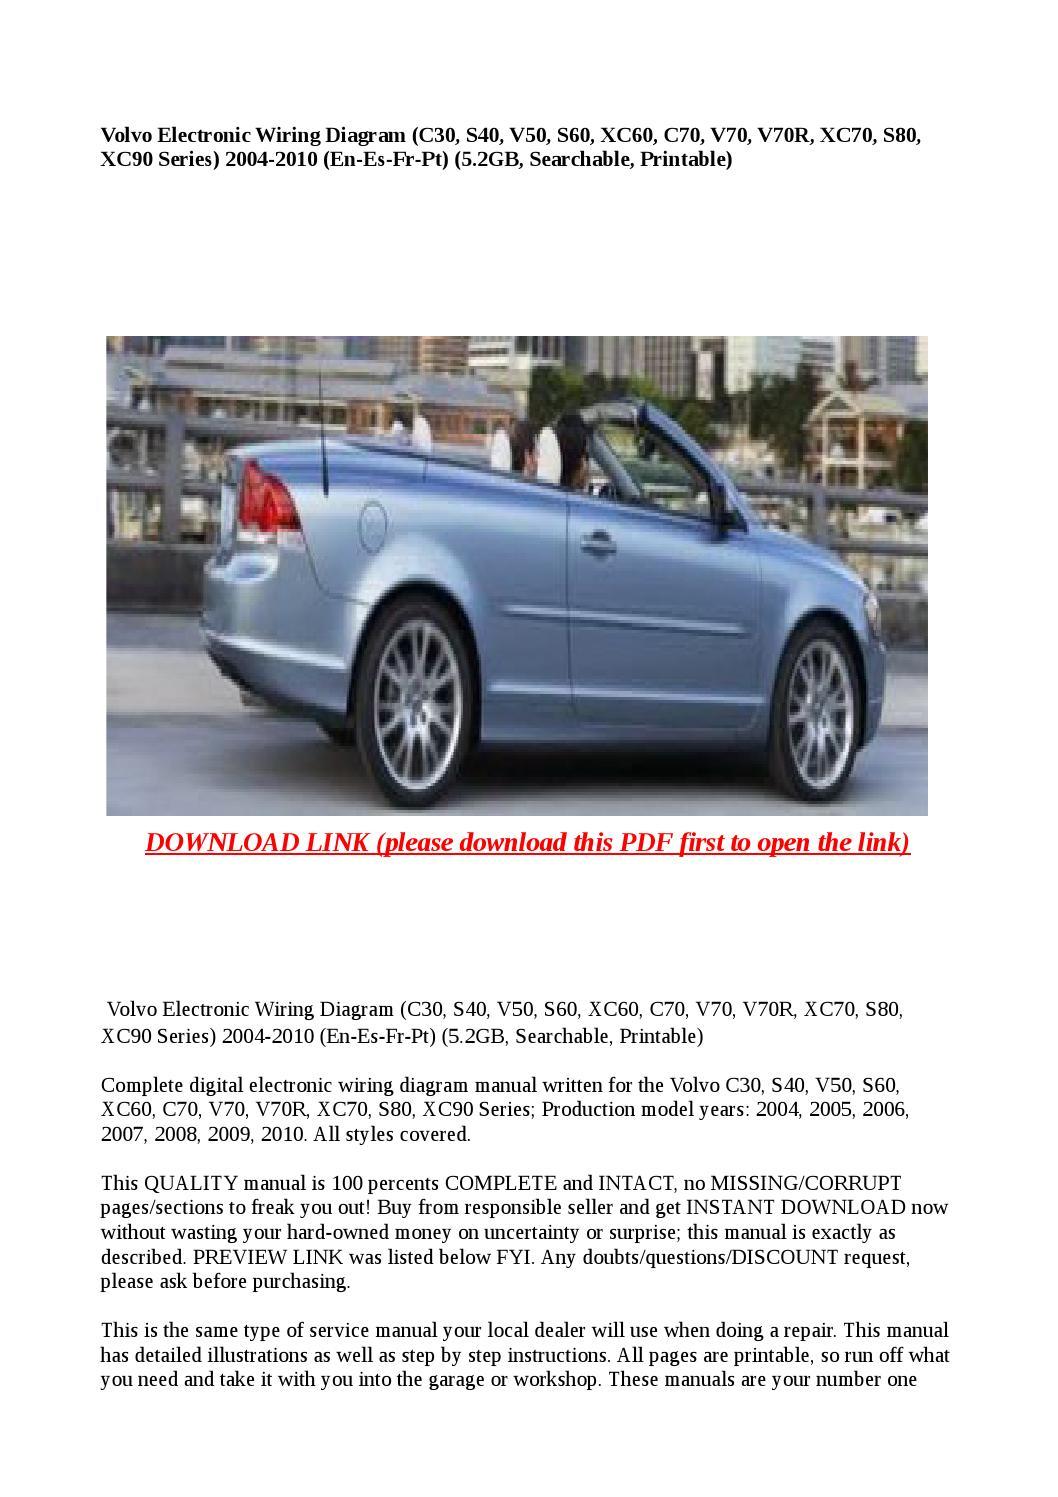 Volvo Electronic Wiring Diagram C30 S40 V50 S60 Xc60 C70 V70 Xc70 V70r S80 Xc90 Series 2 By Buhbu Issuu